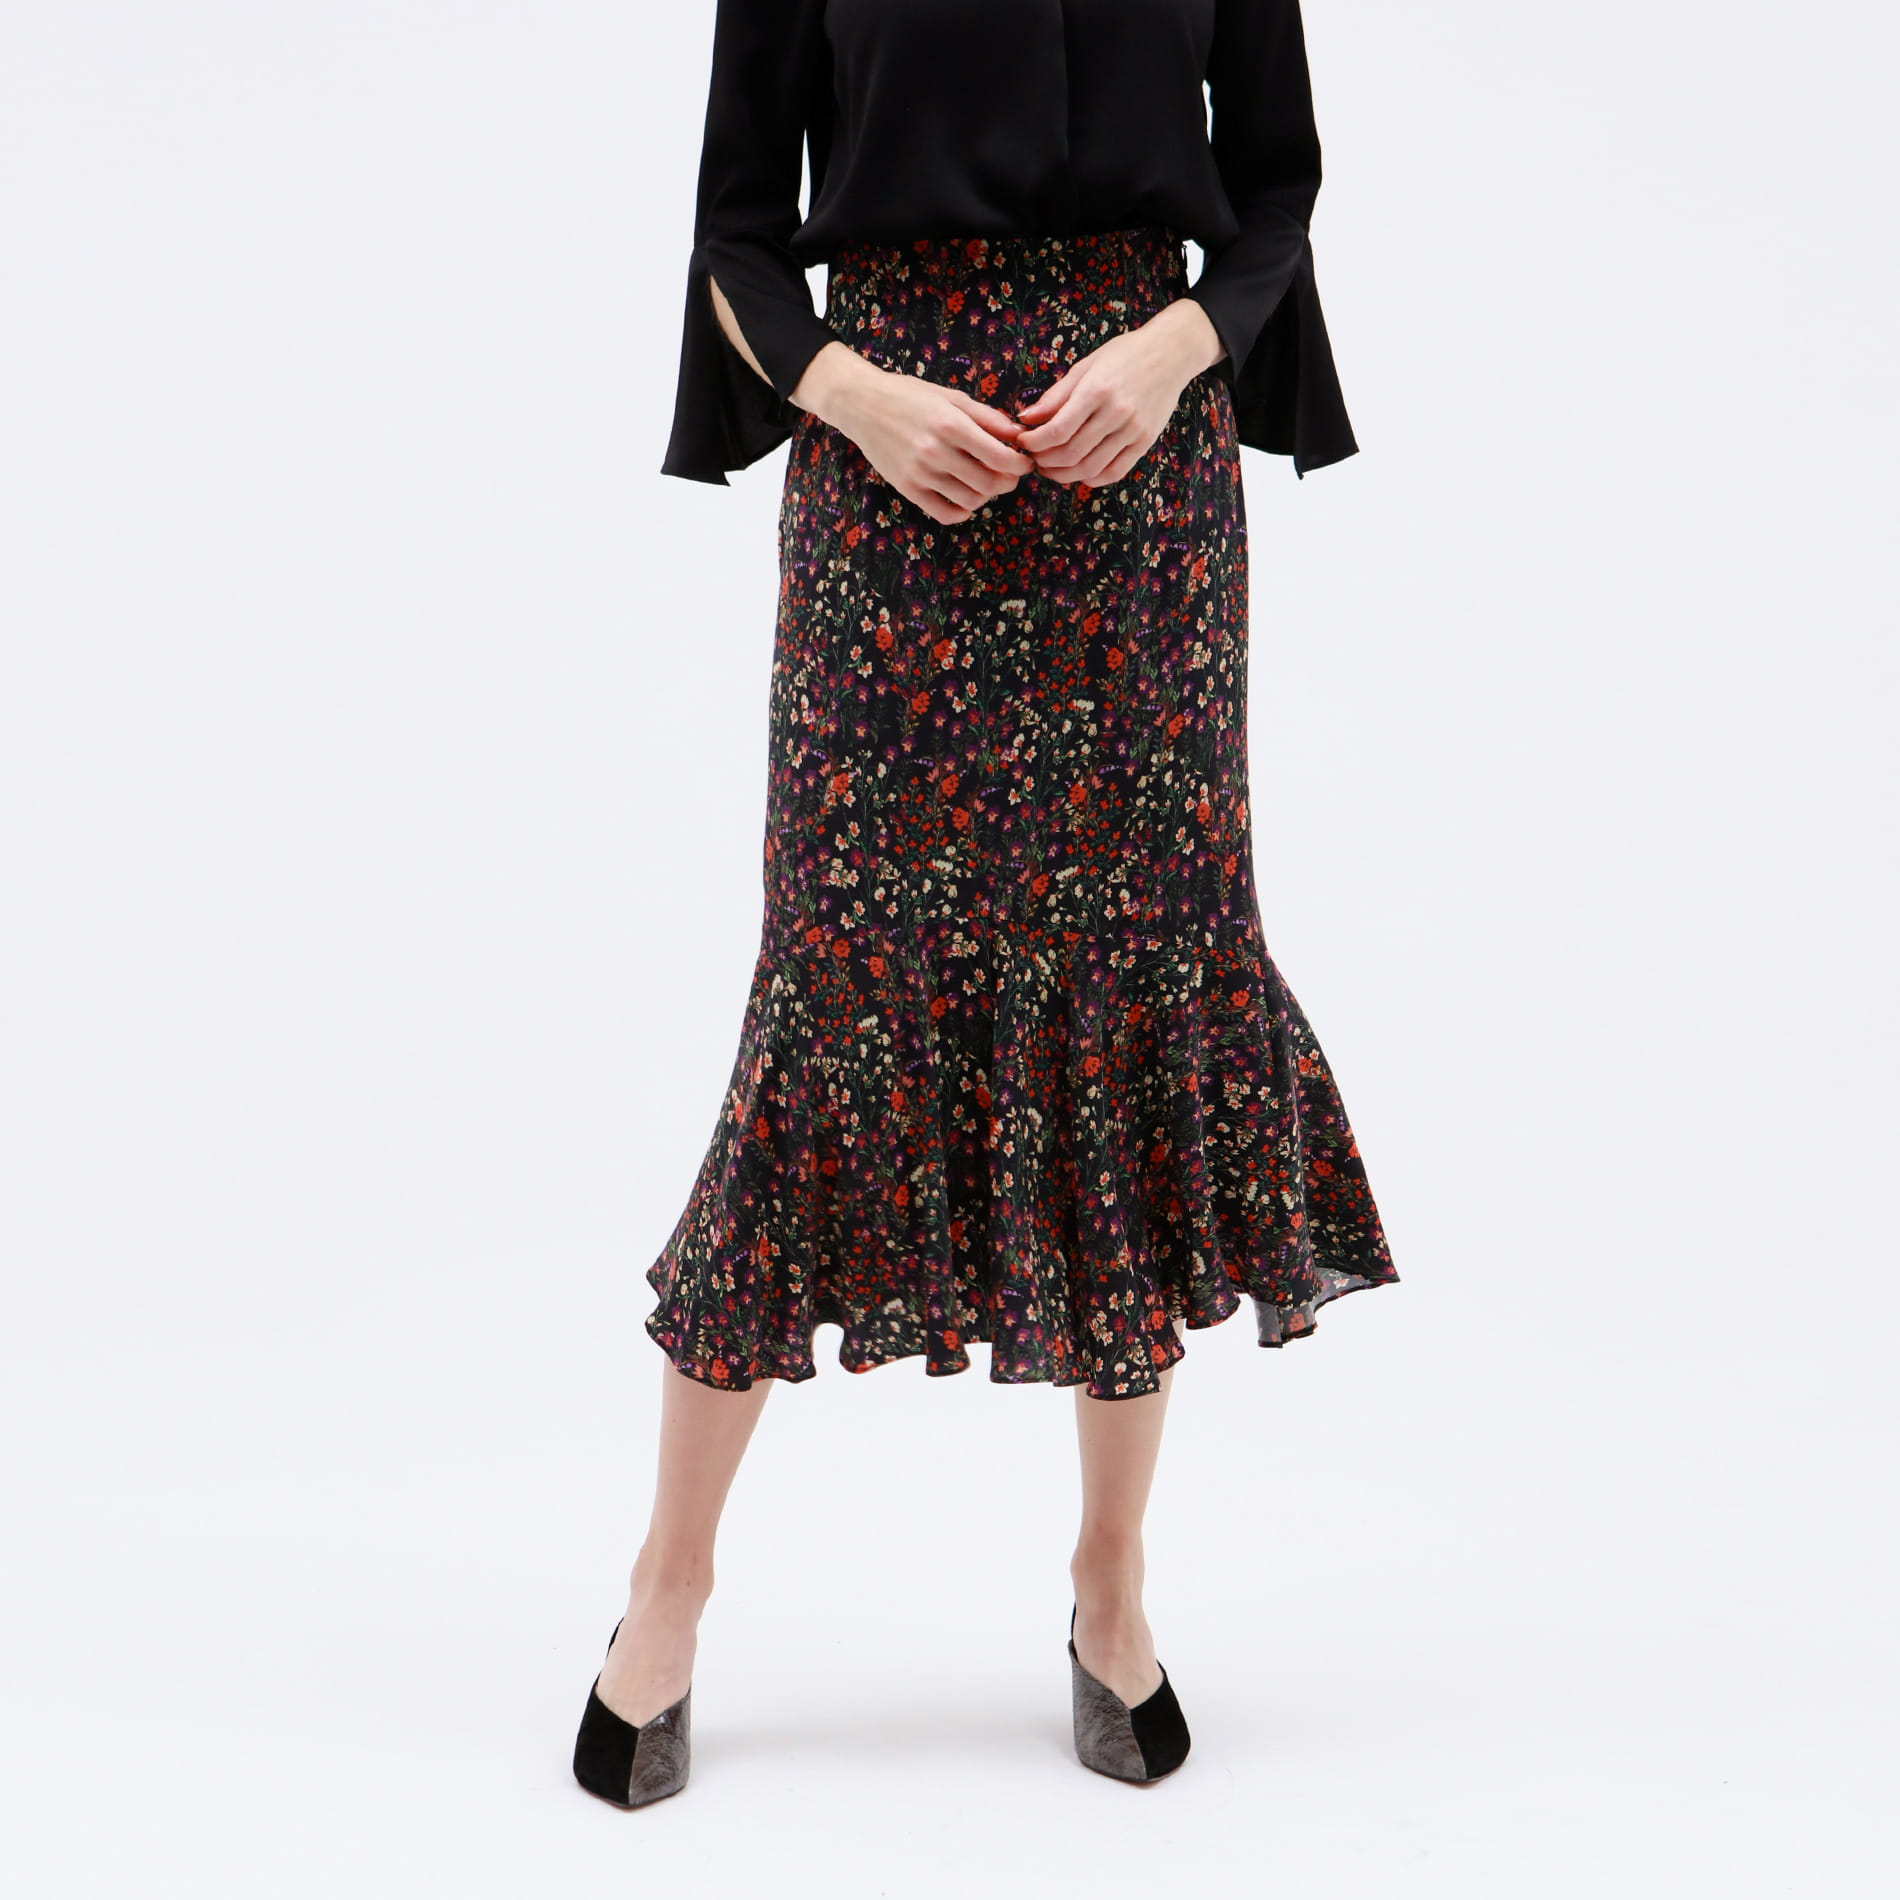 【otonaMUSE10月号掲載】ヴィンテージ フラワー マーメイドスカート